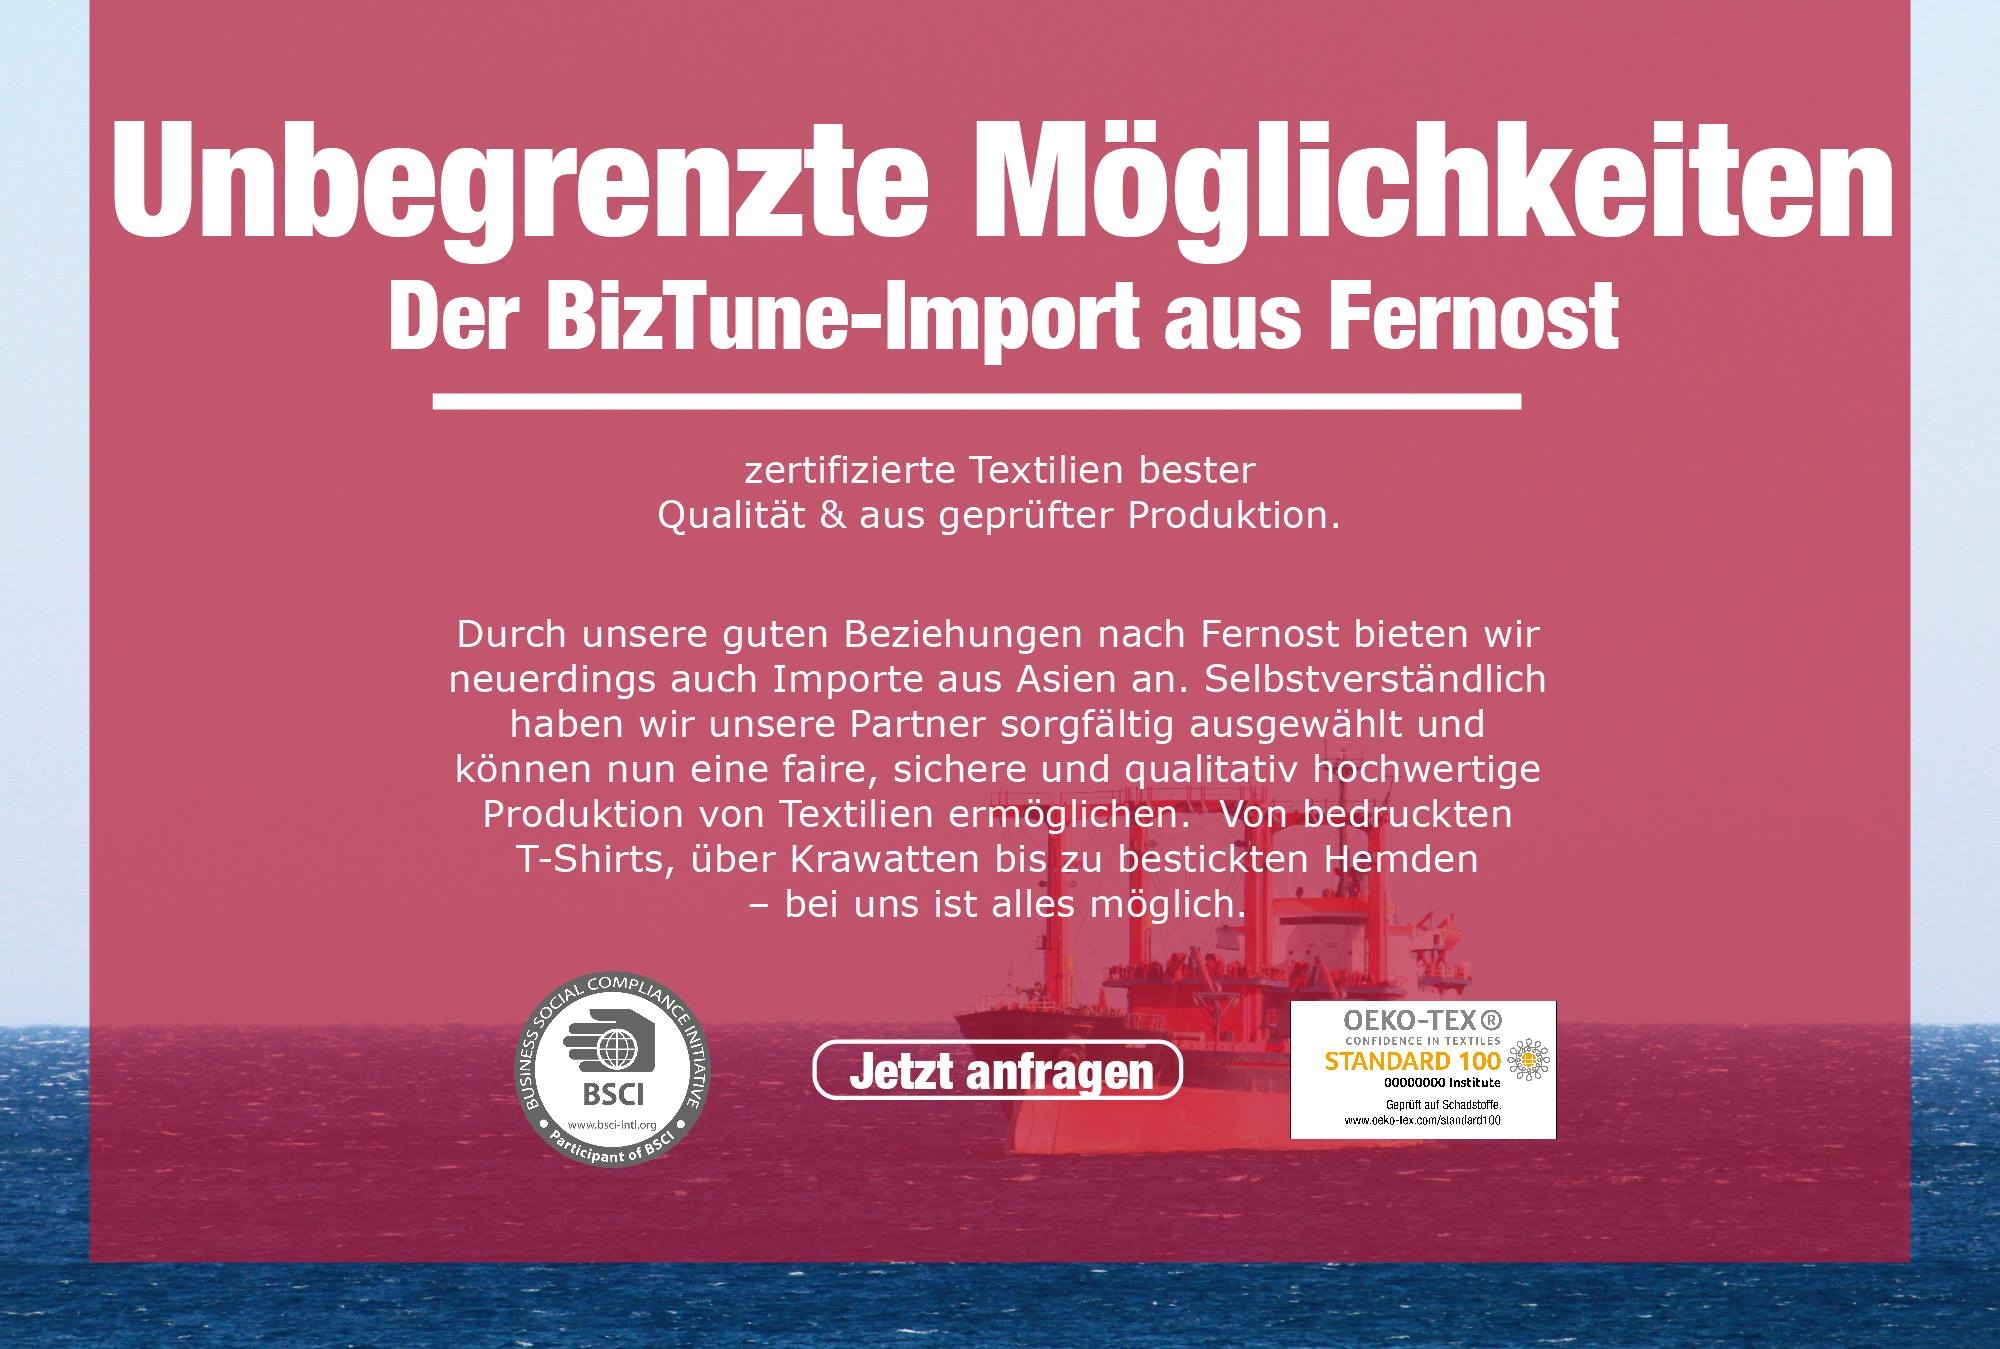 BizTune Importe